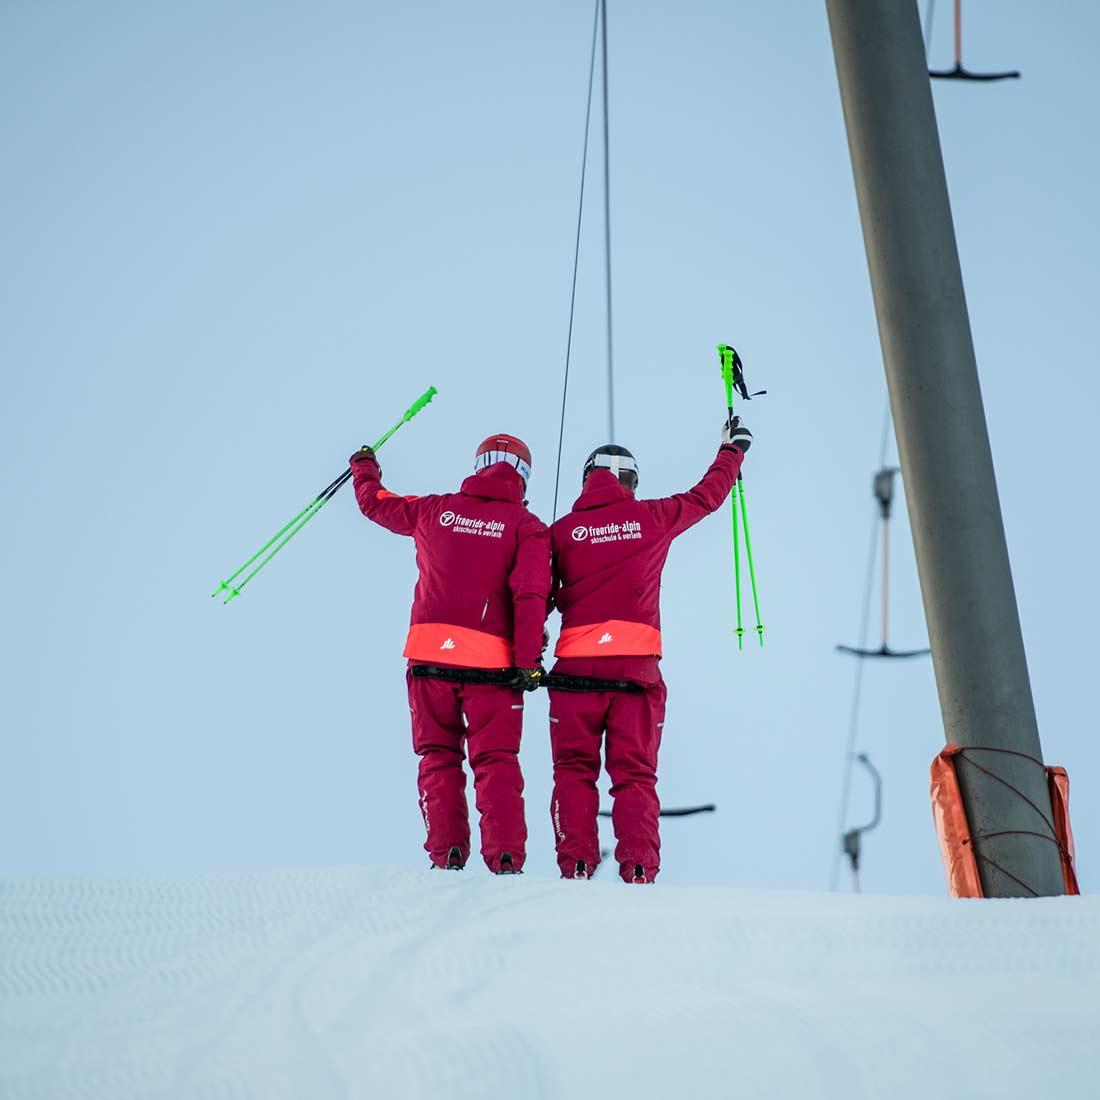 Skilehrer am Lift